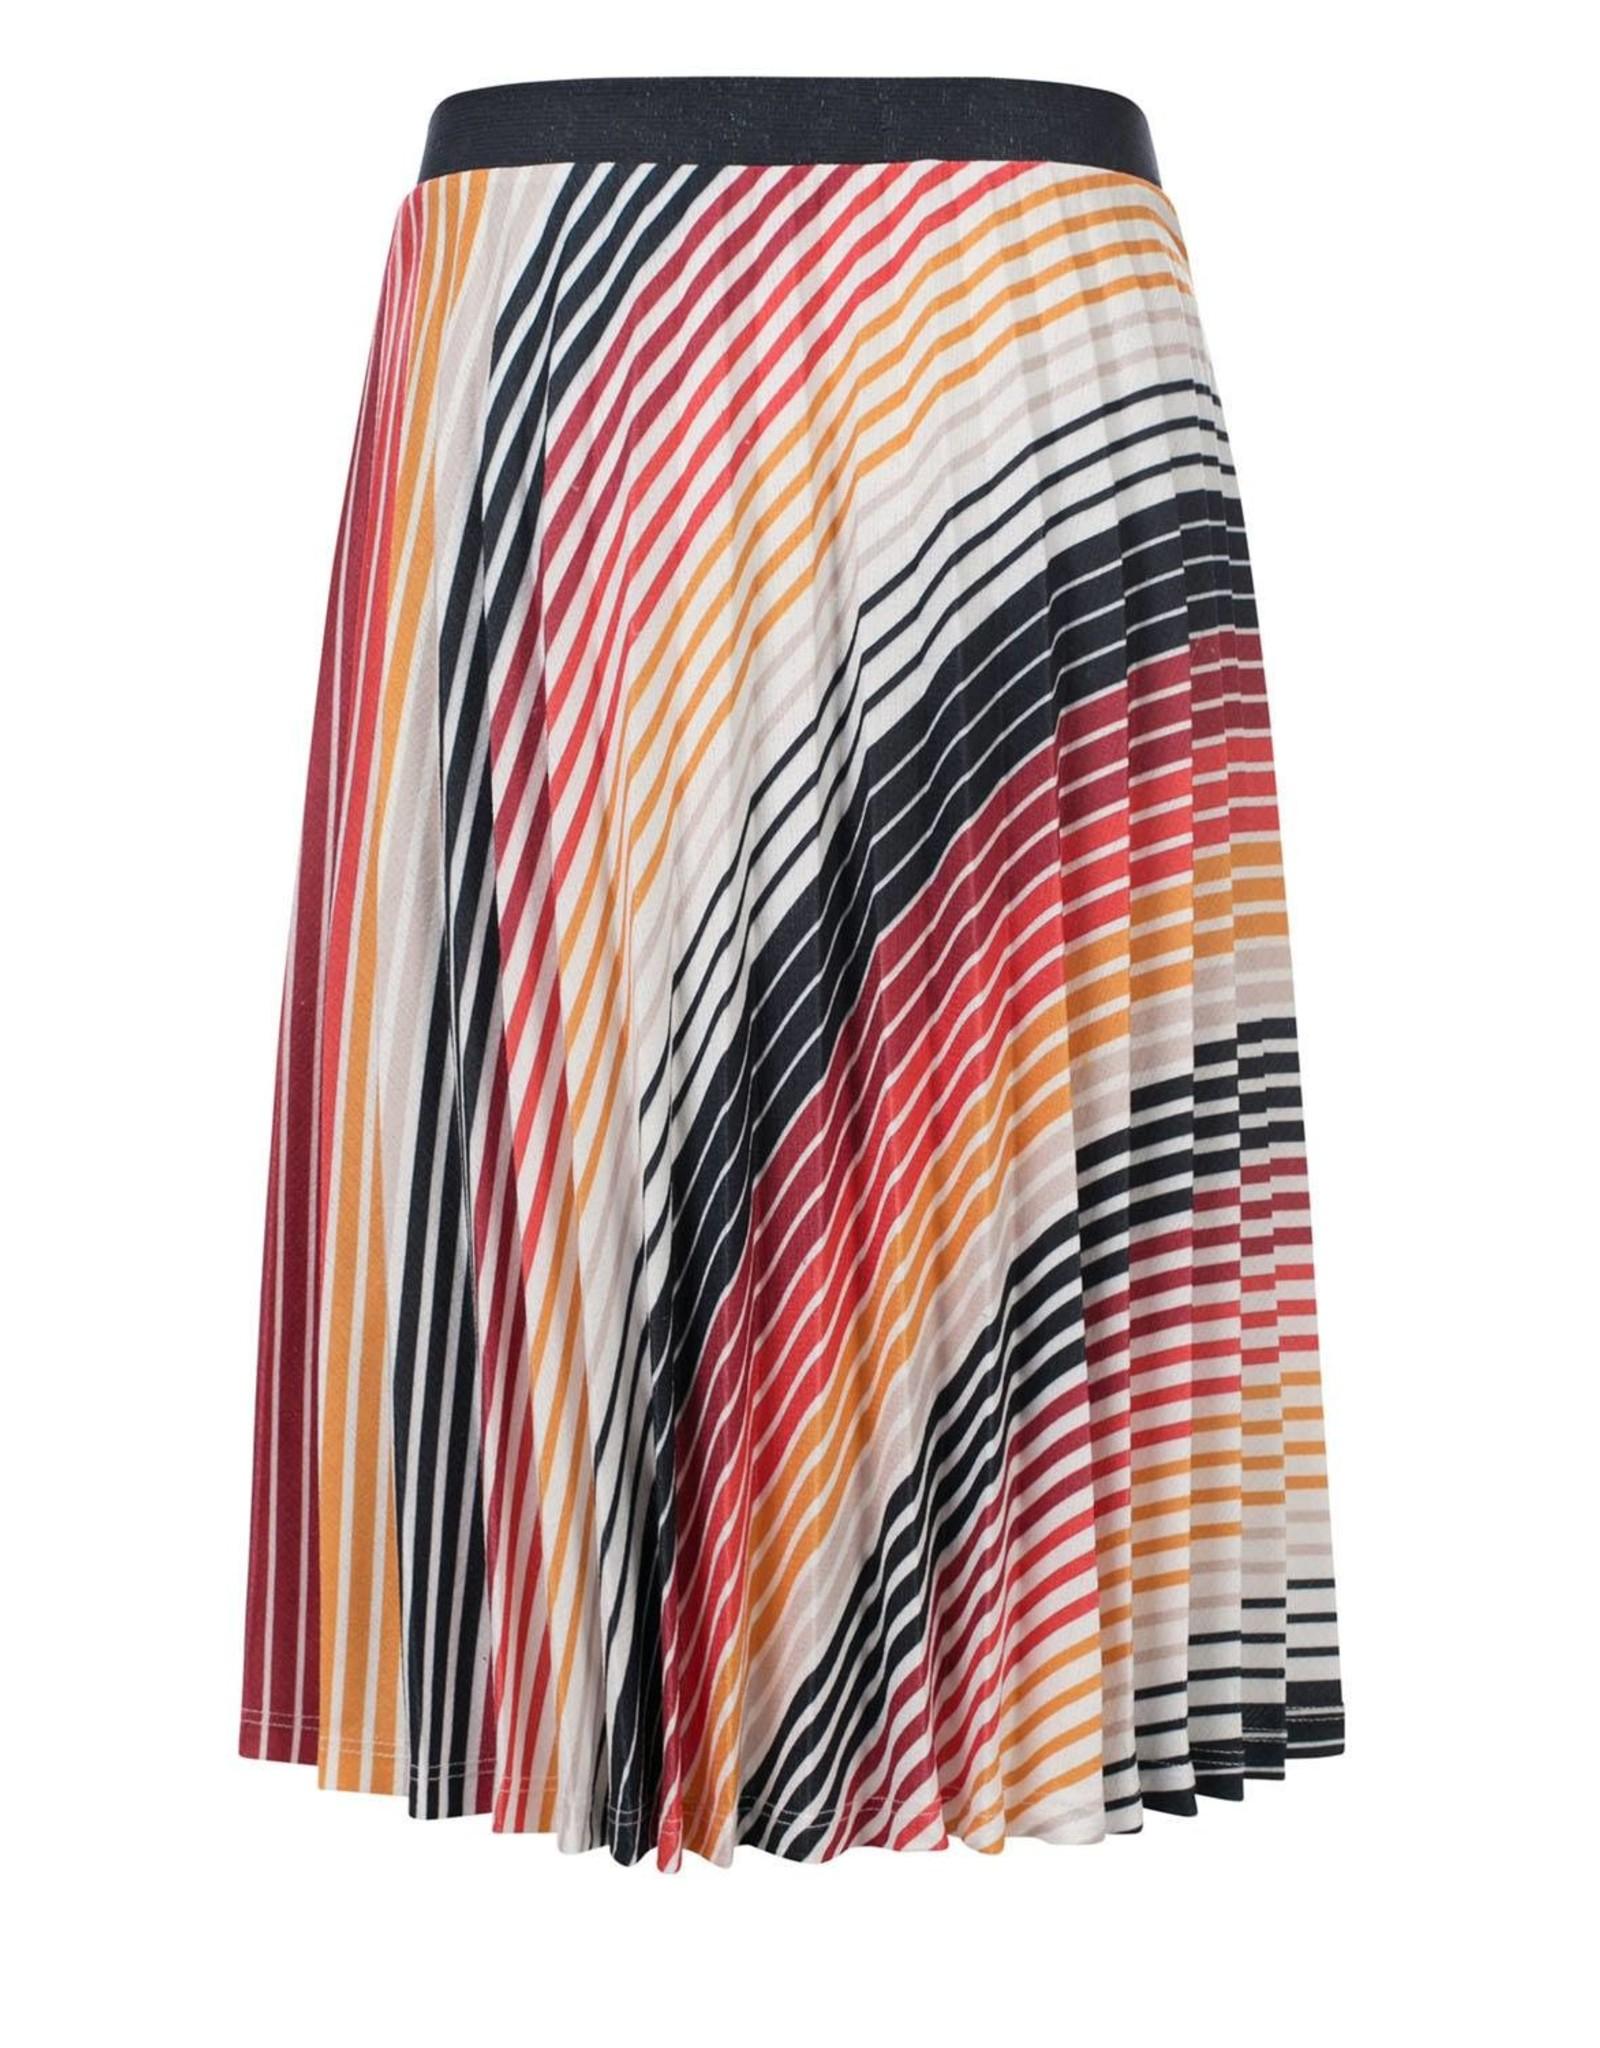 LOOXS 10sixteen pleated skirt GRADIENT STRIPE